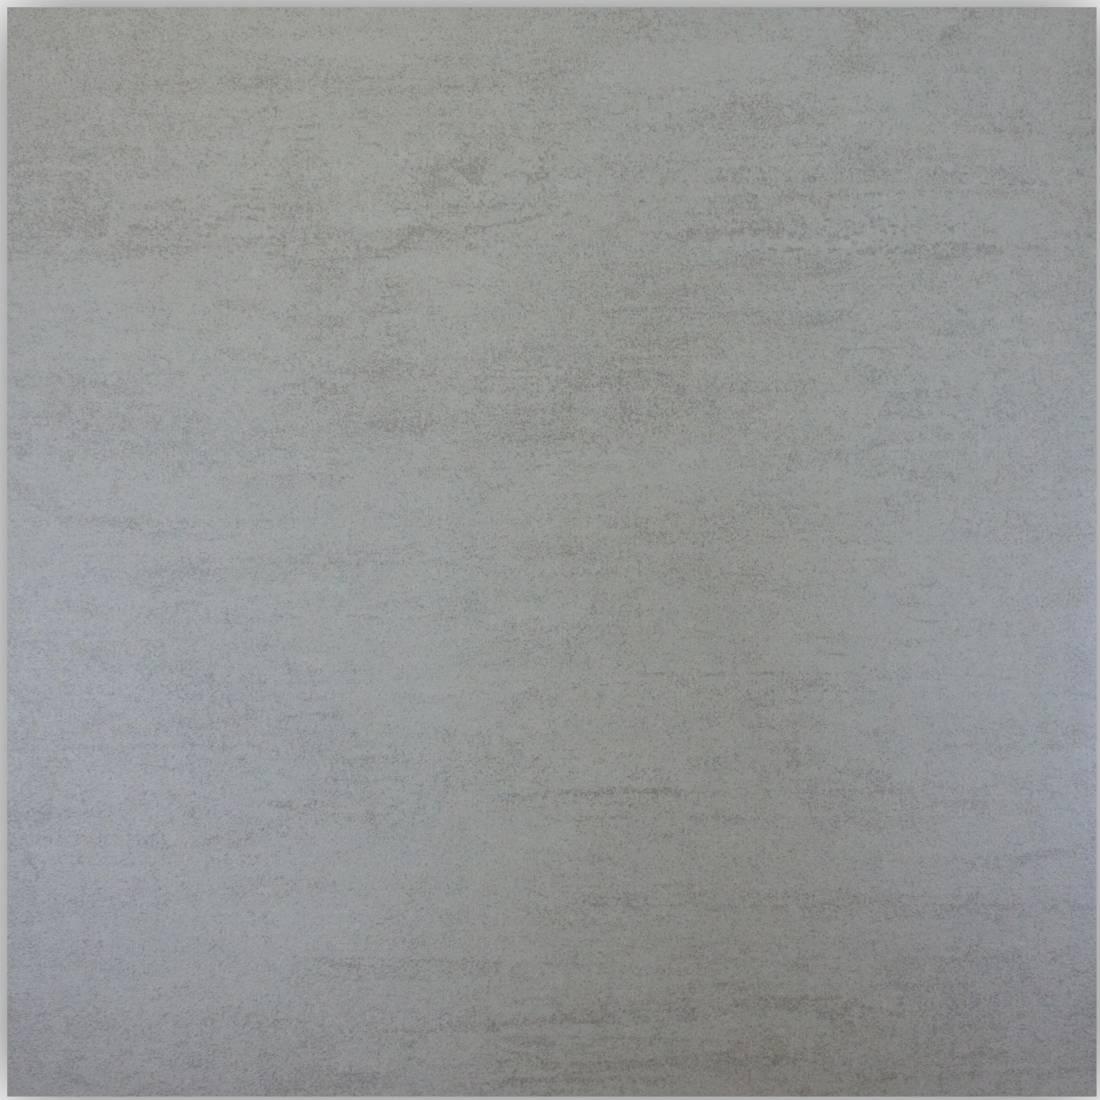 Cement 40x40 Dark Grey Matt 1